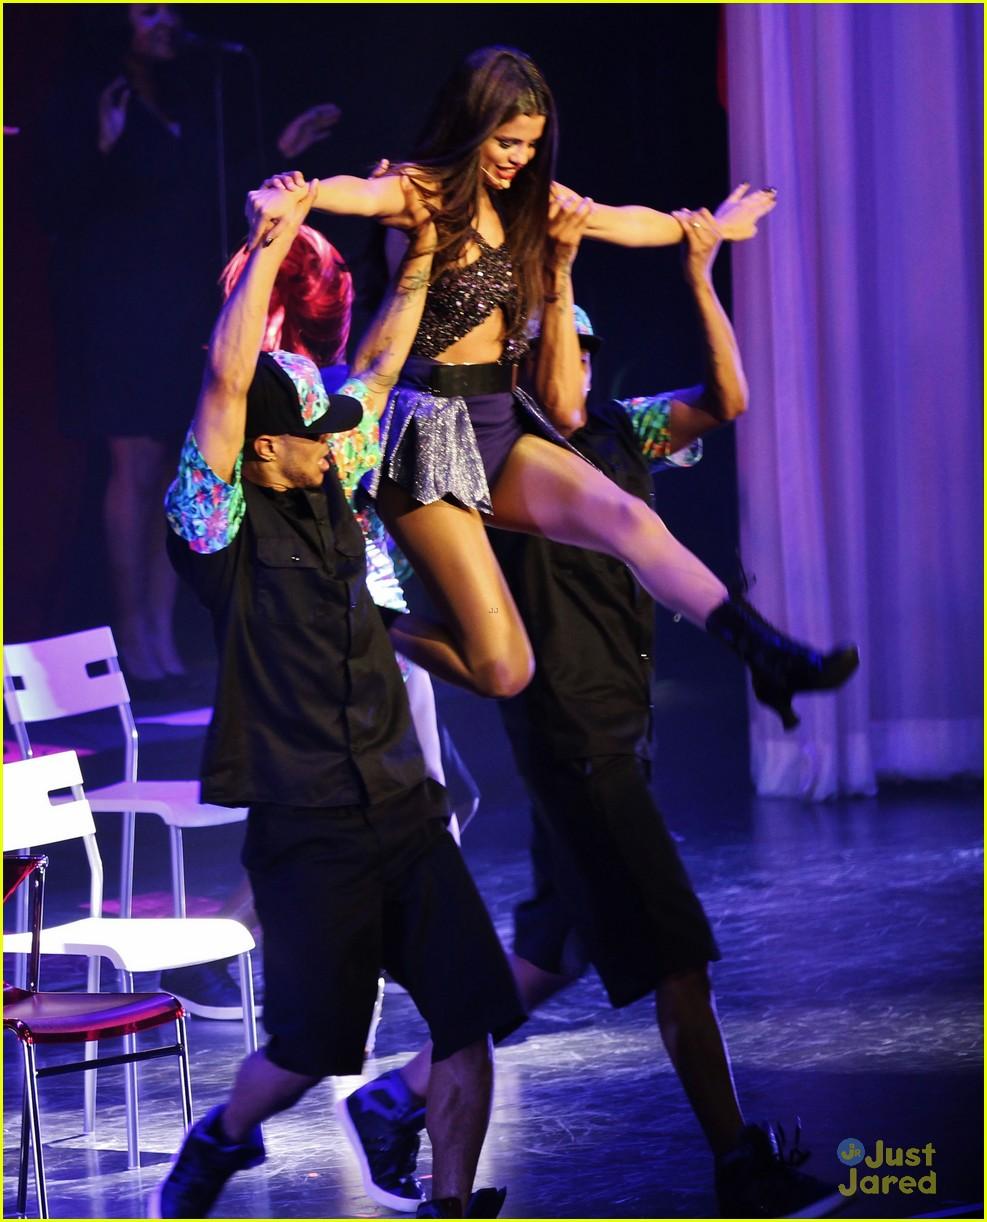 selena gomez stars dance tour kick off pics 28